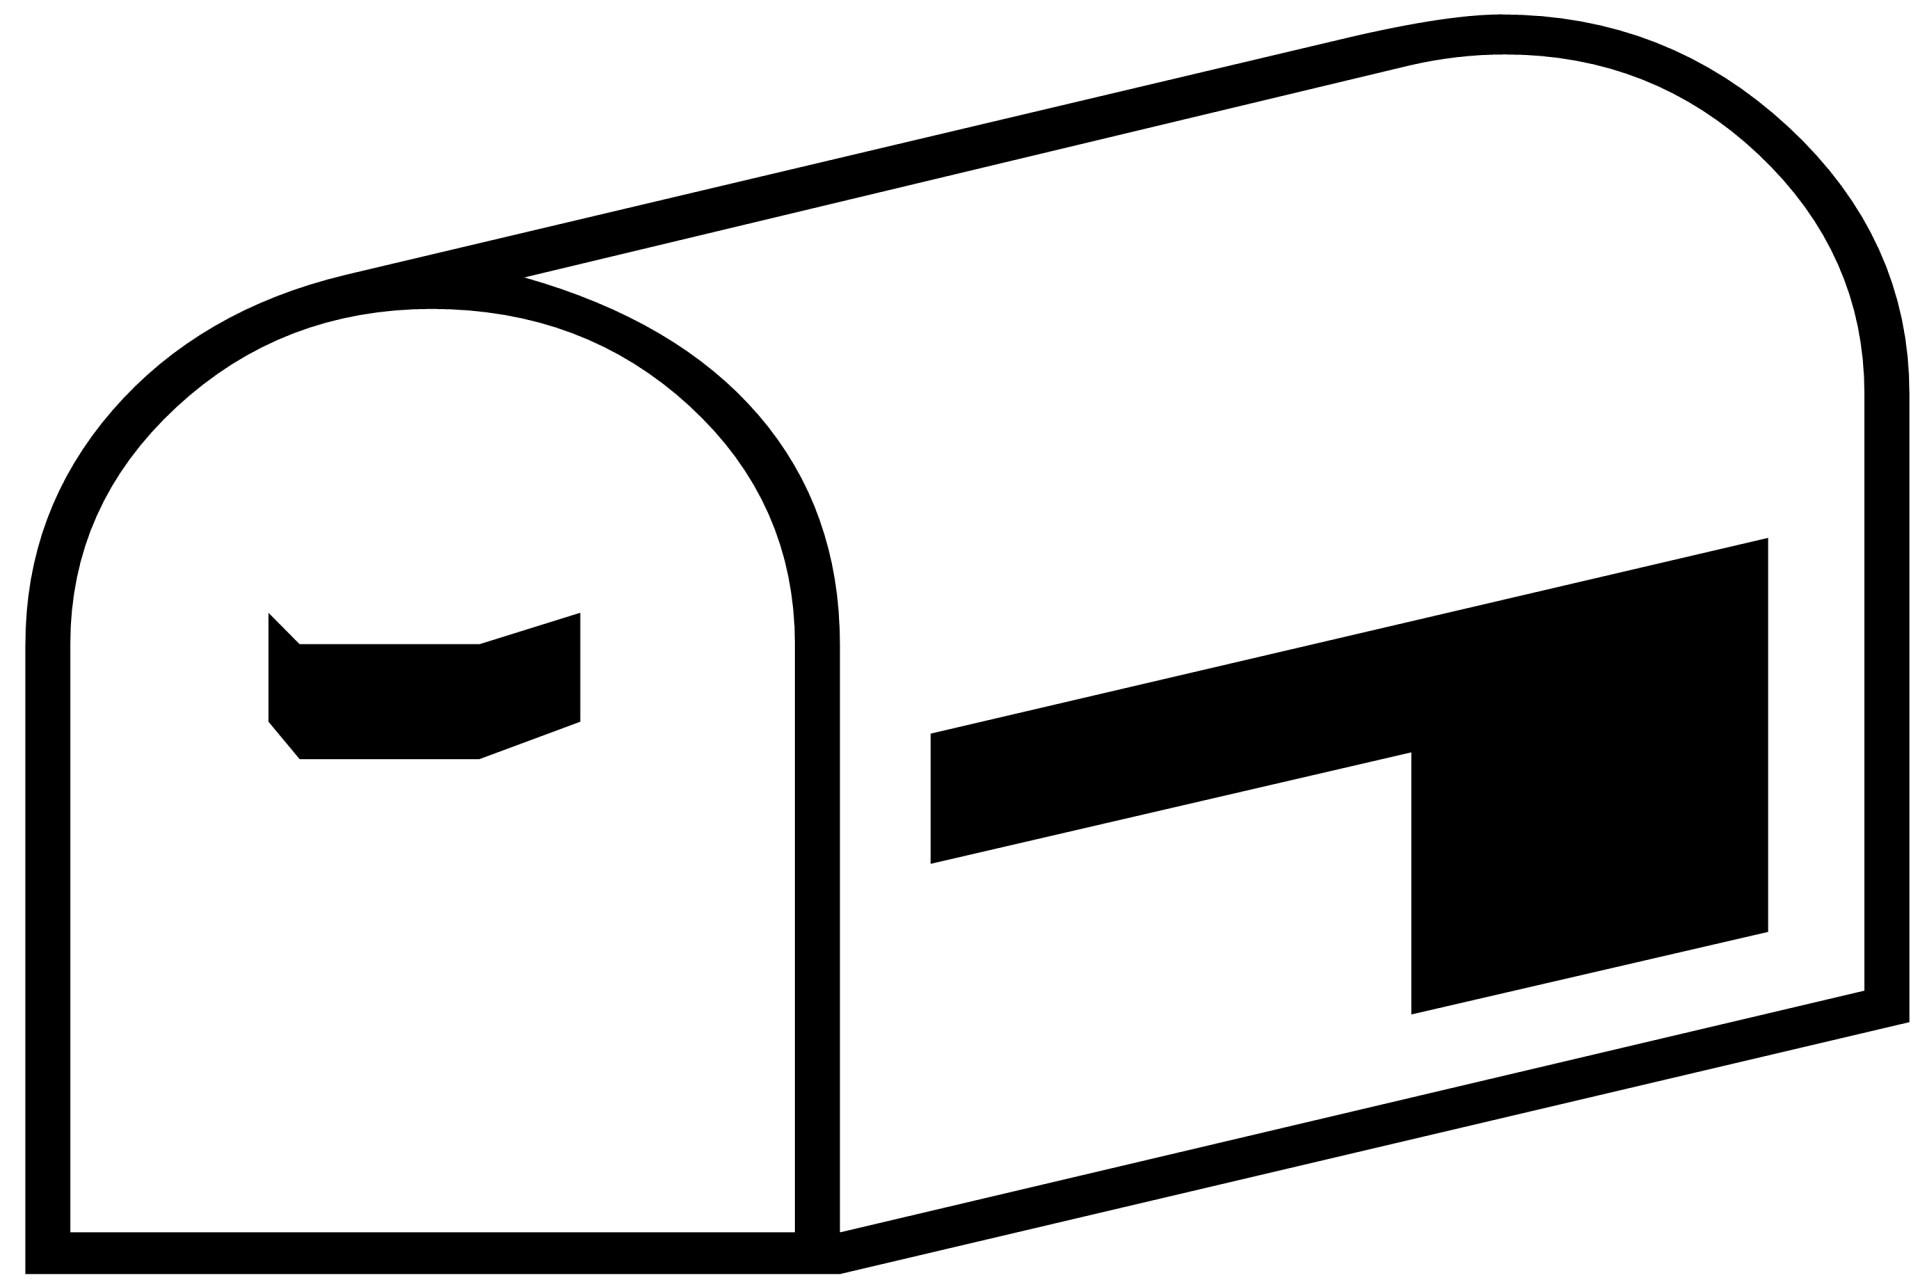 Mailbox Silhouette Free Stock Photo